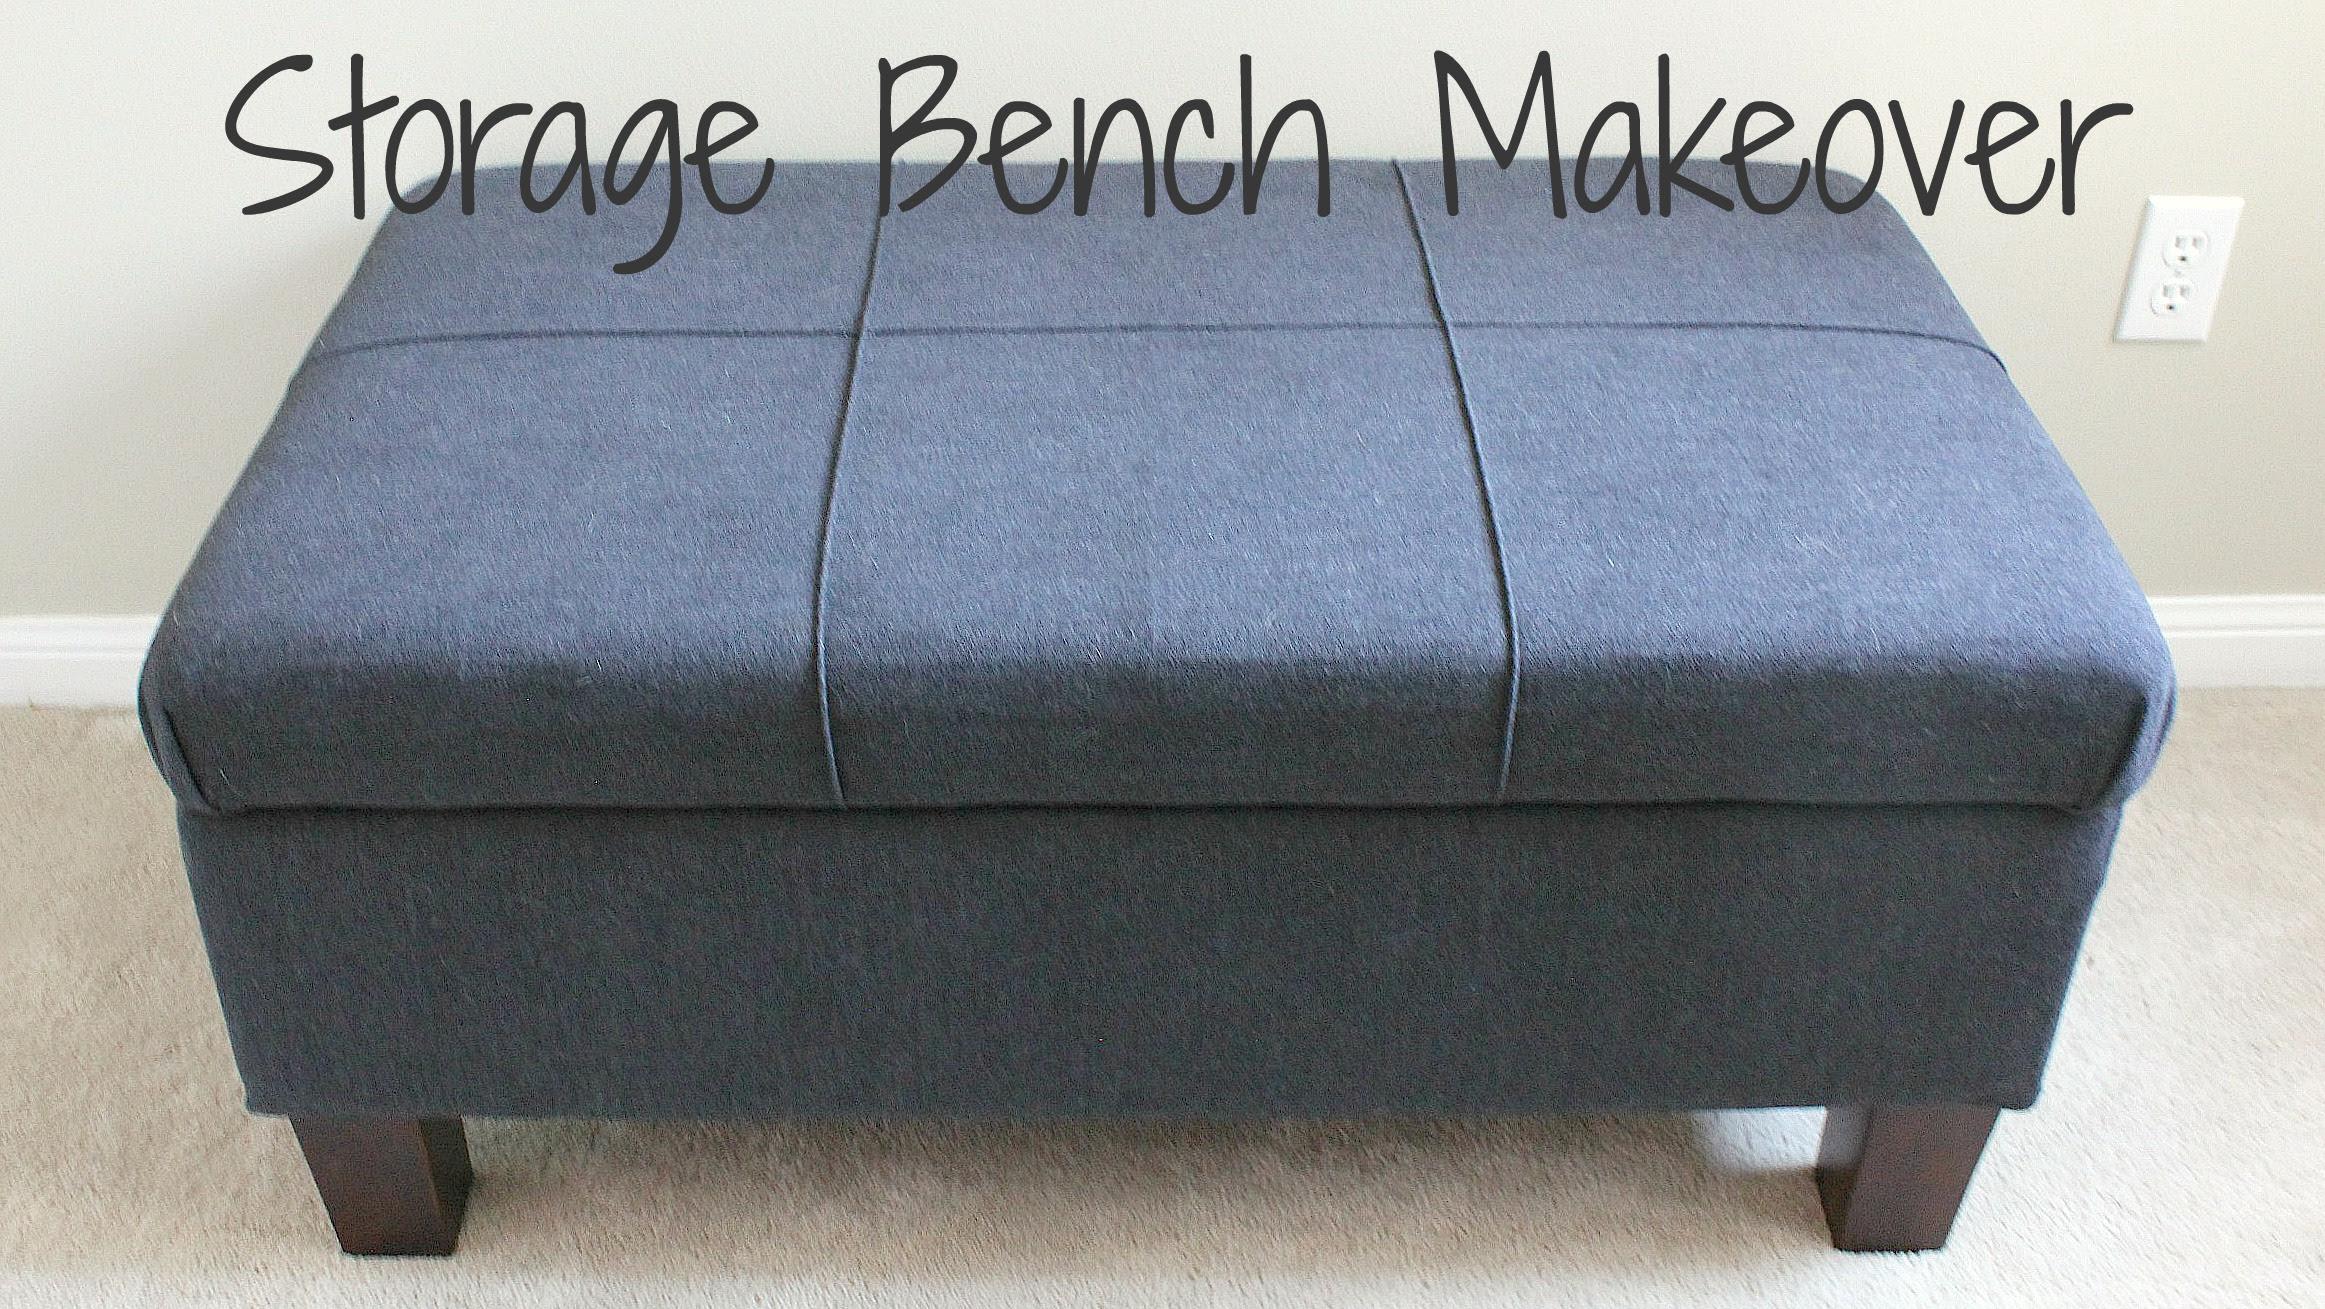 storage bench makeover